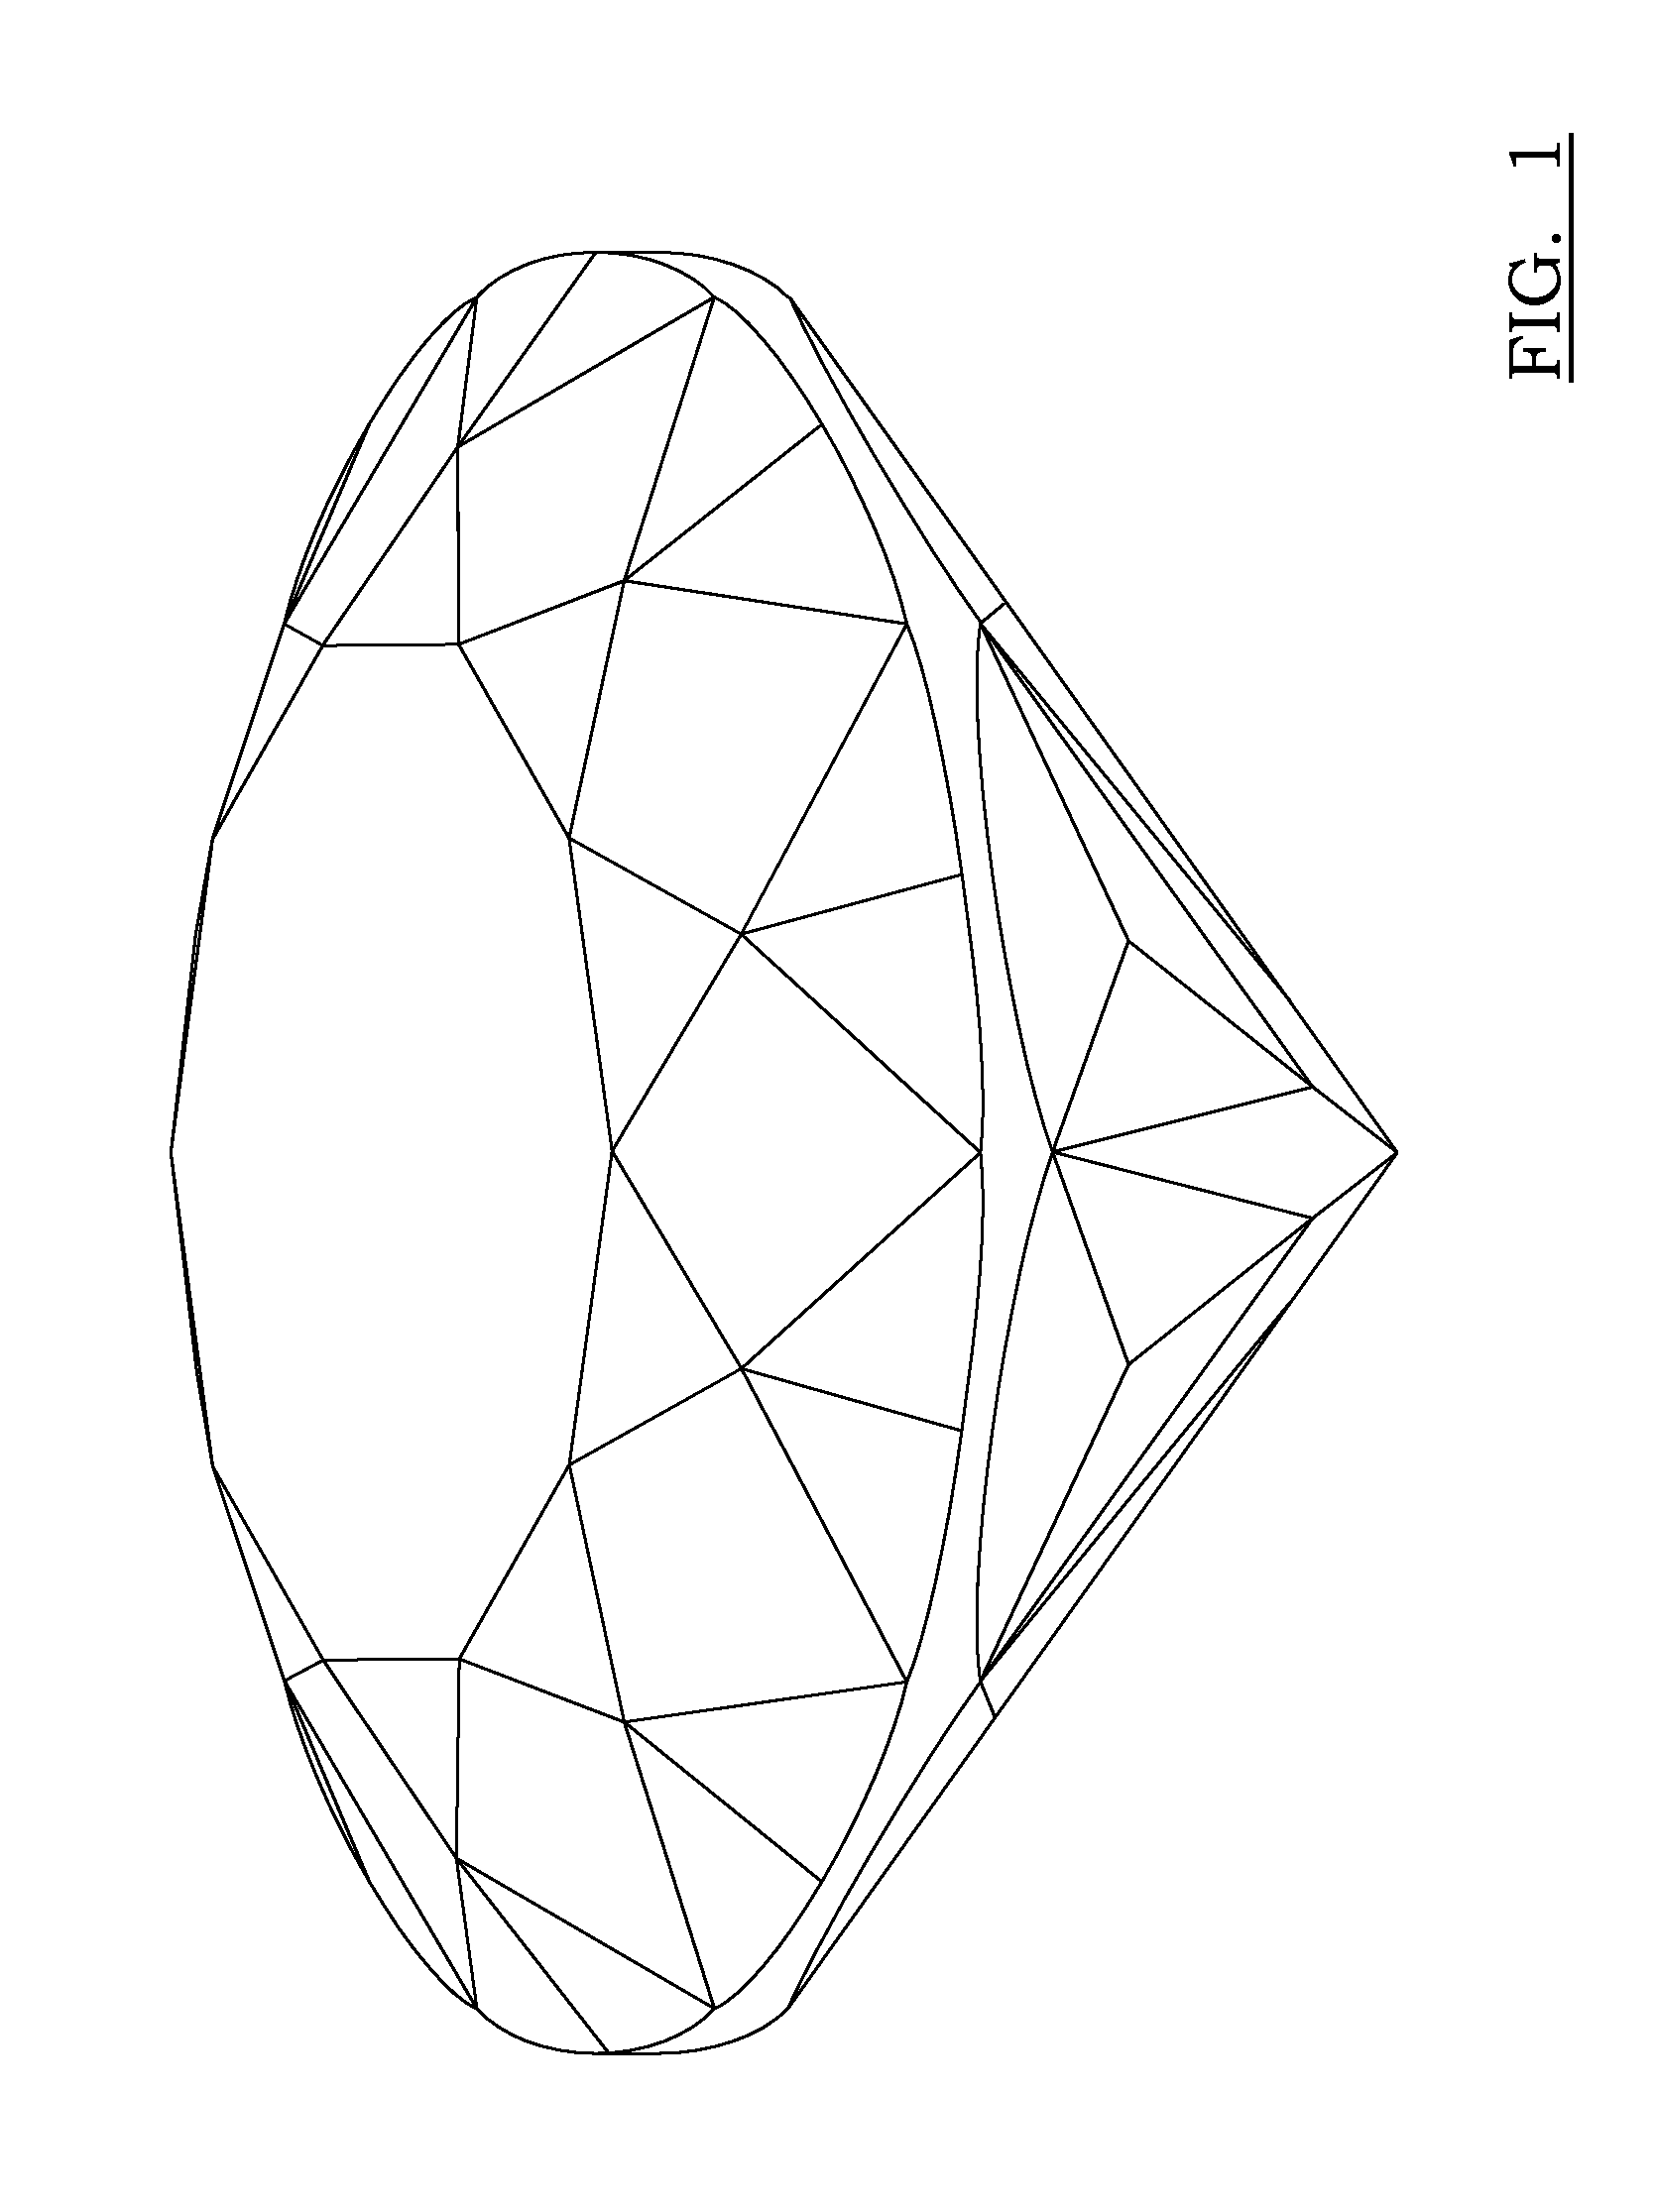 patent usd632205 eightyone facet brilliant cut diamond